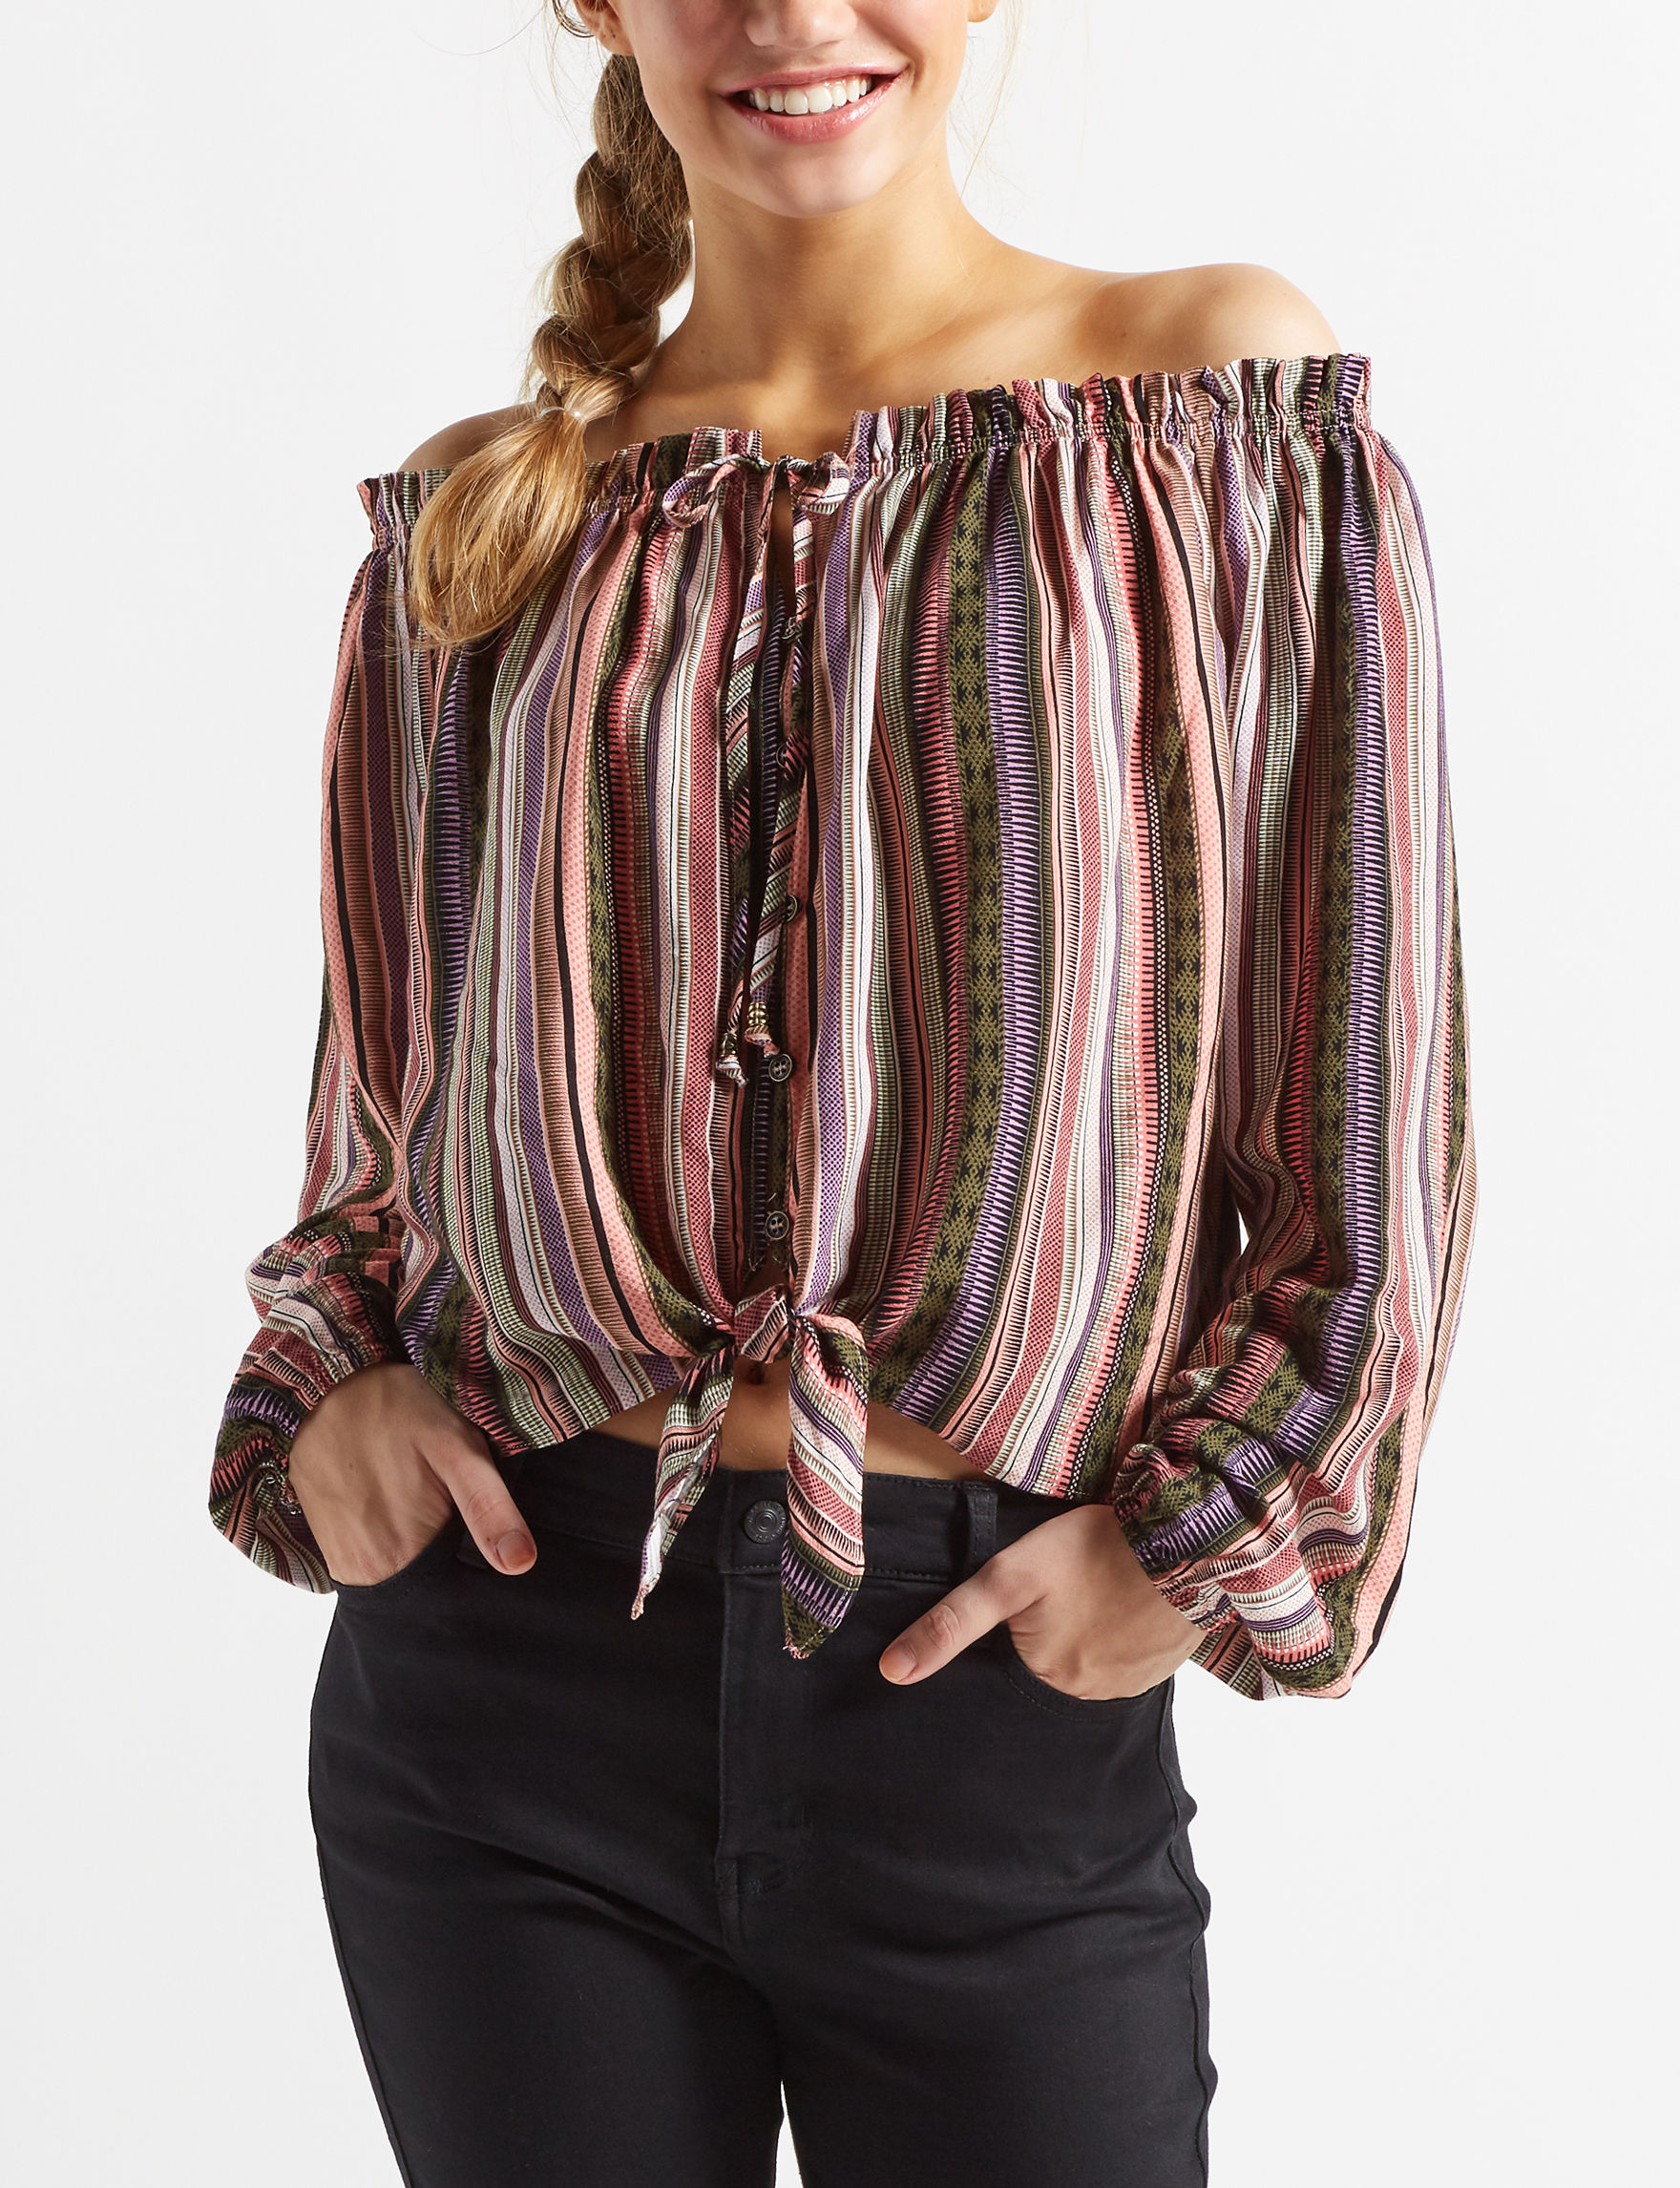 Jolt Black / Coral Shirts & Blouses